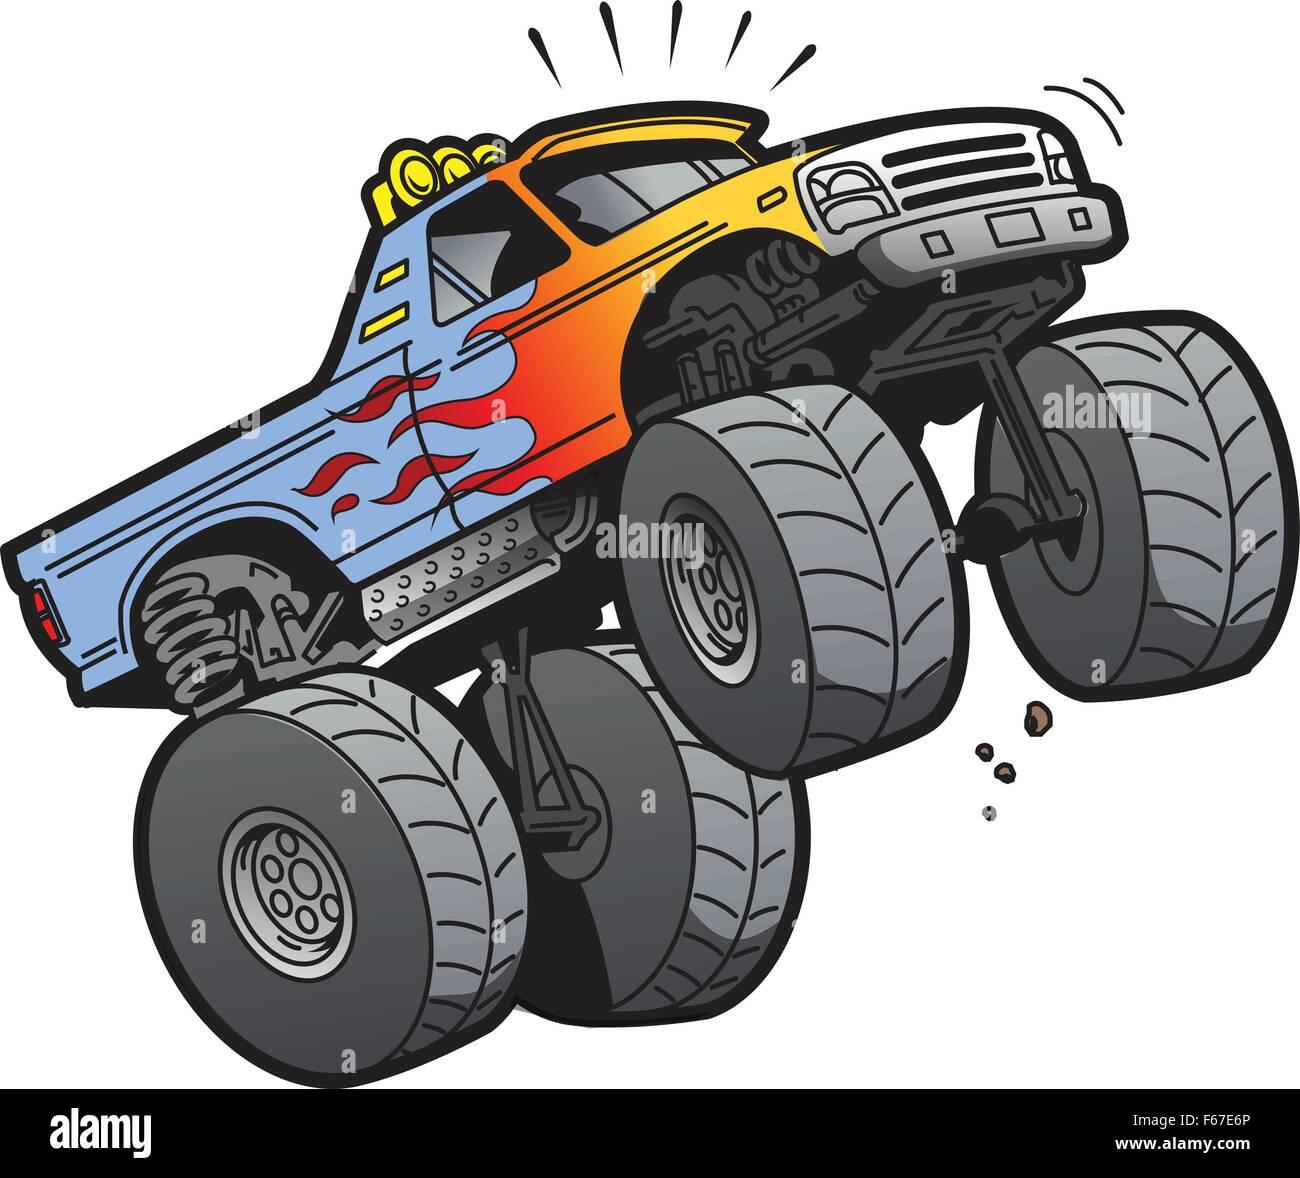 Perfecto Dibujos Animados De Chevy Silverado Modelo - Enmarcado Para ...